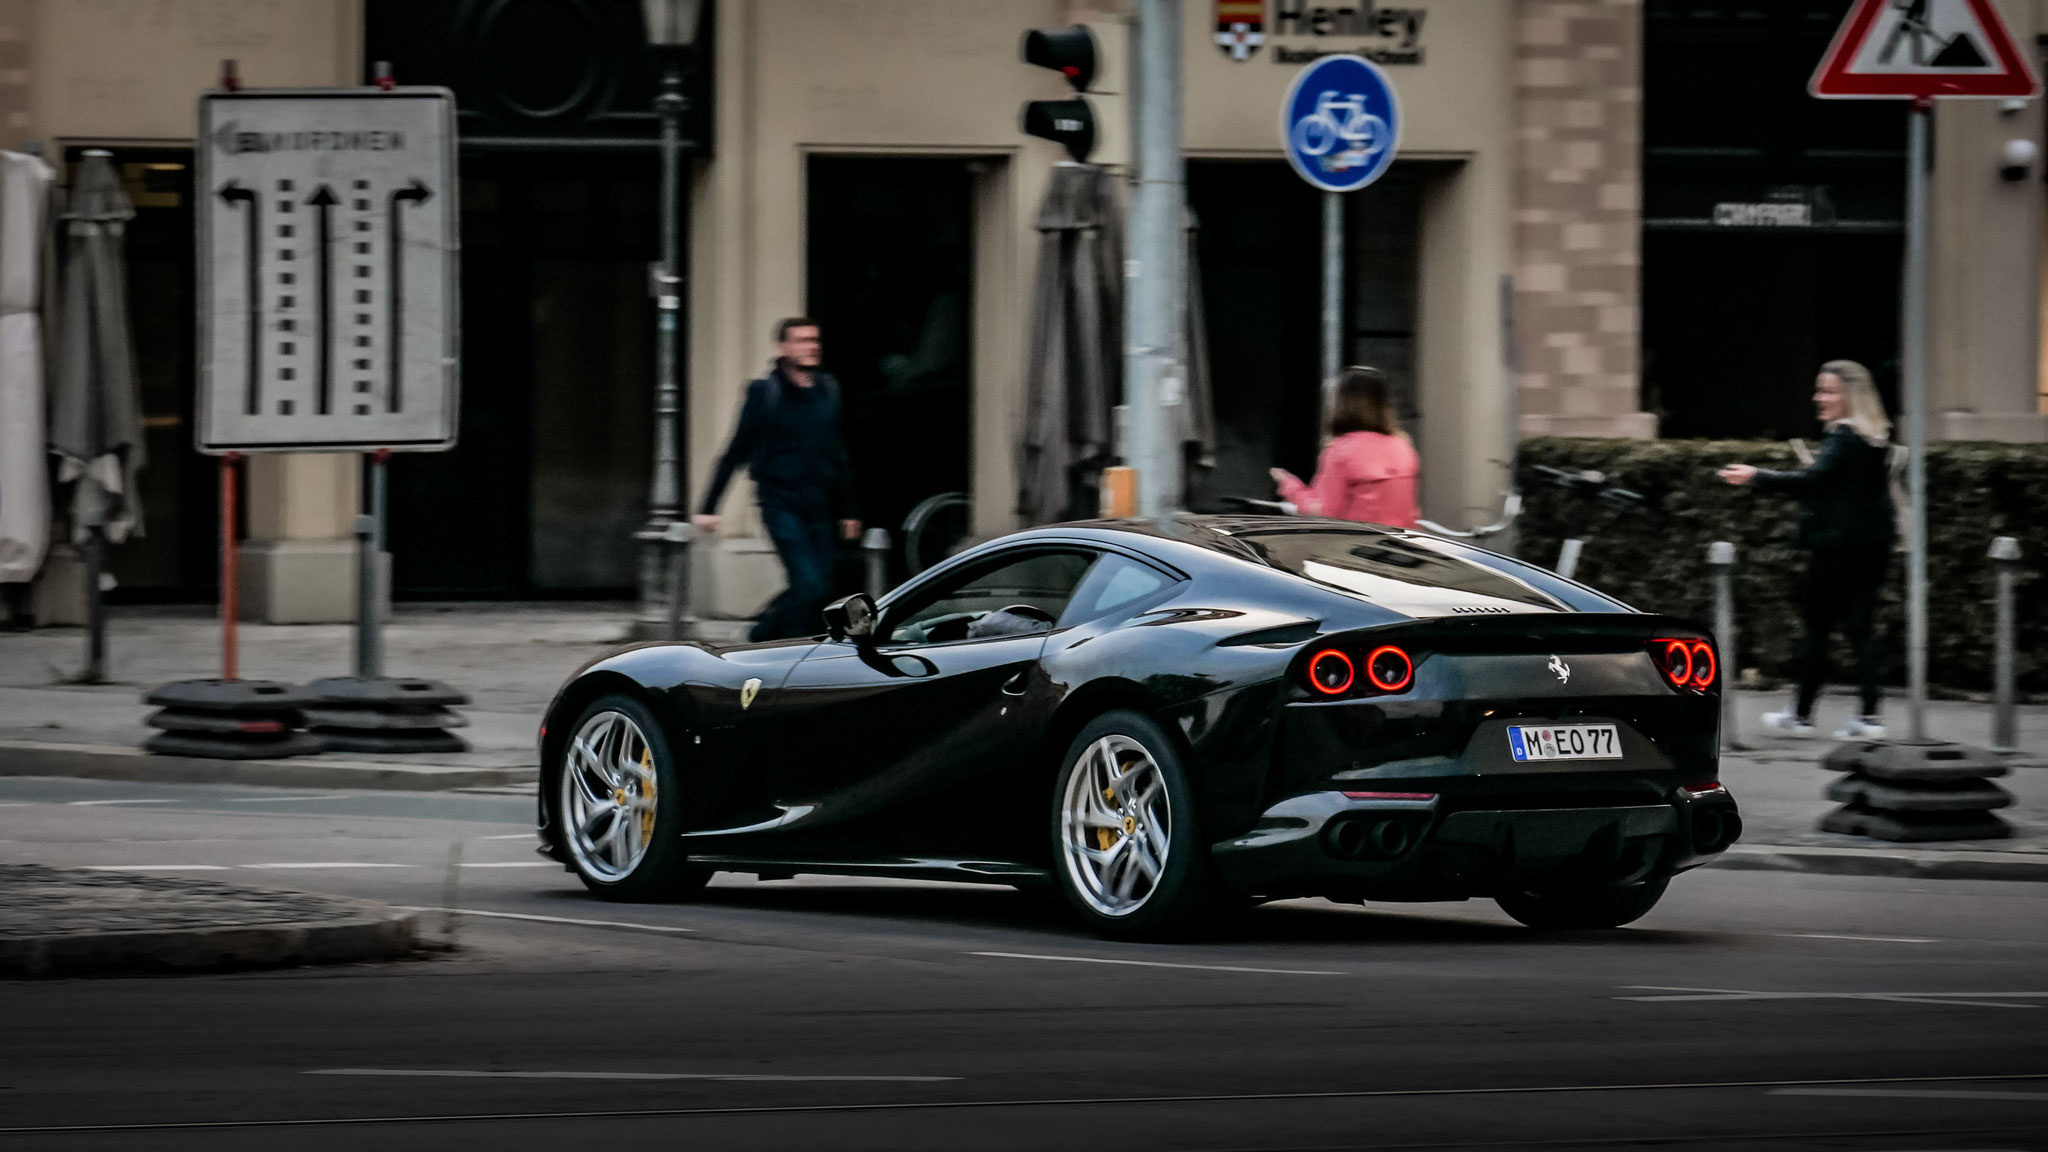 Ferrari 812 Superfast - M-EO-77